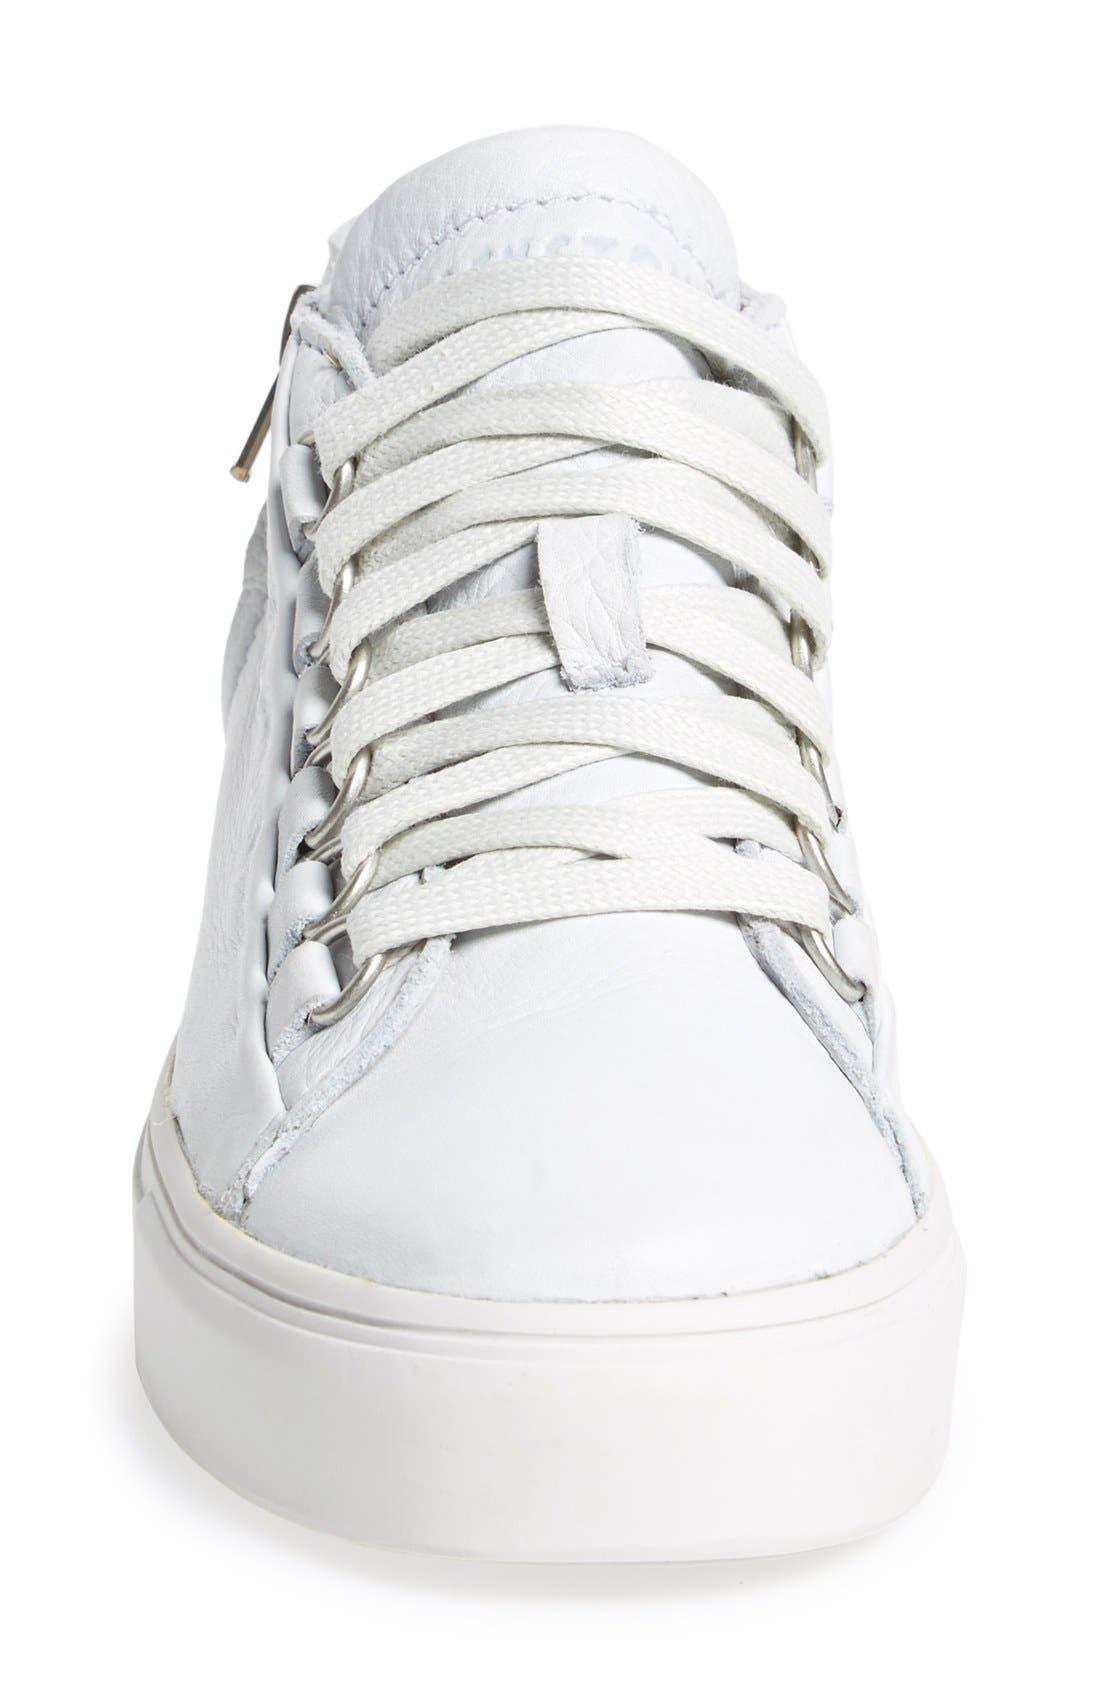 BLACKSTONE, 'LL60' Midi Sneaker, Alternate thumbnail 2, color, WHITE LEATHER